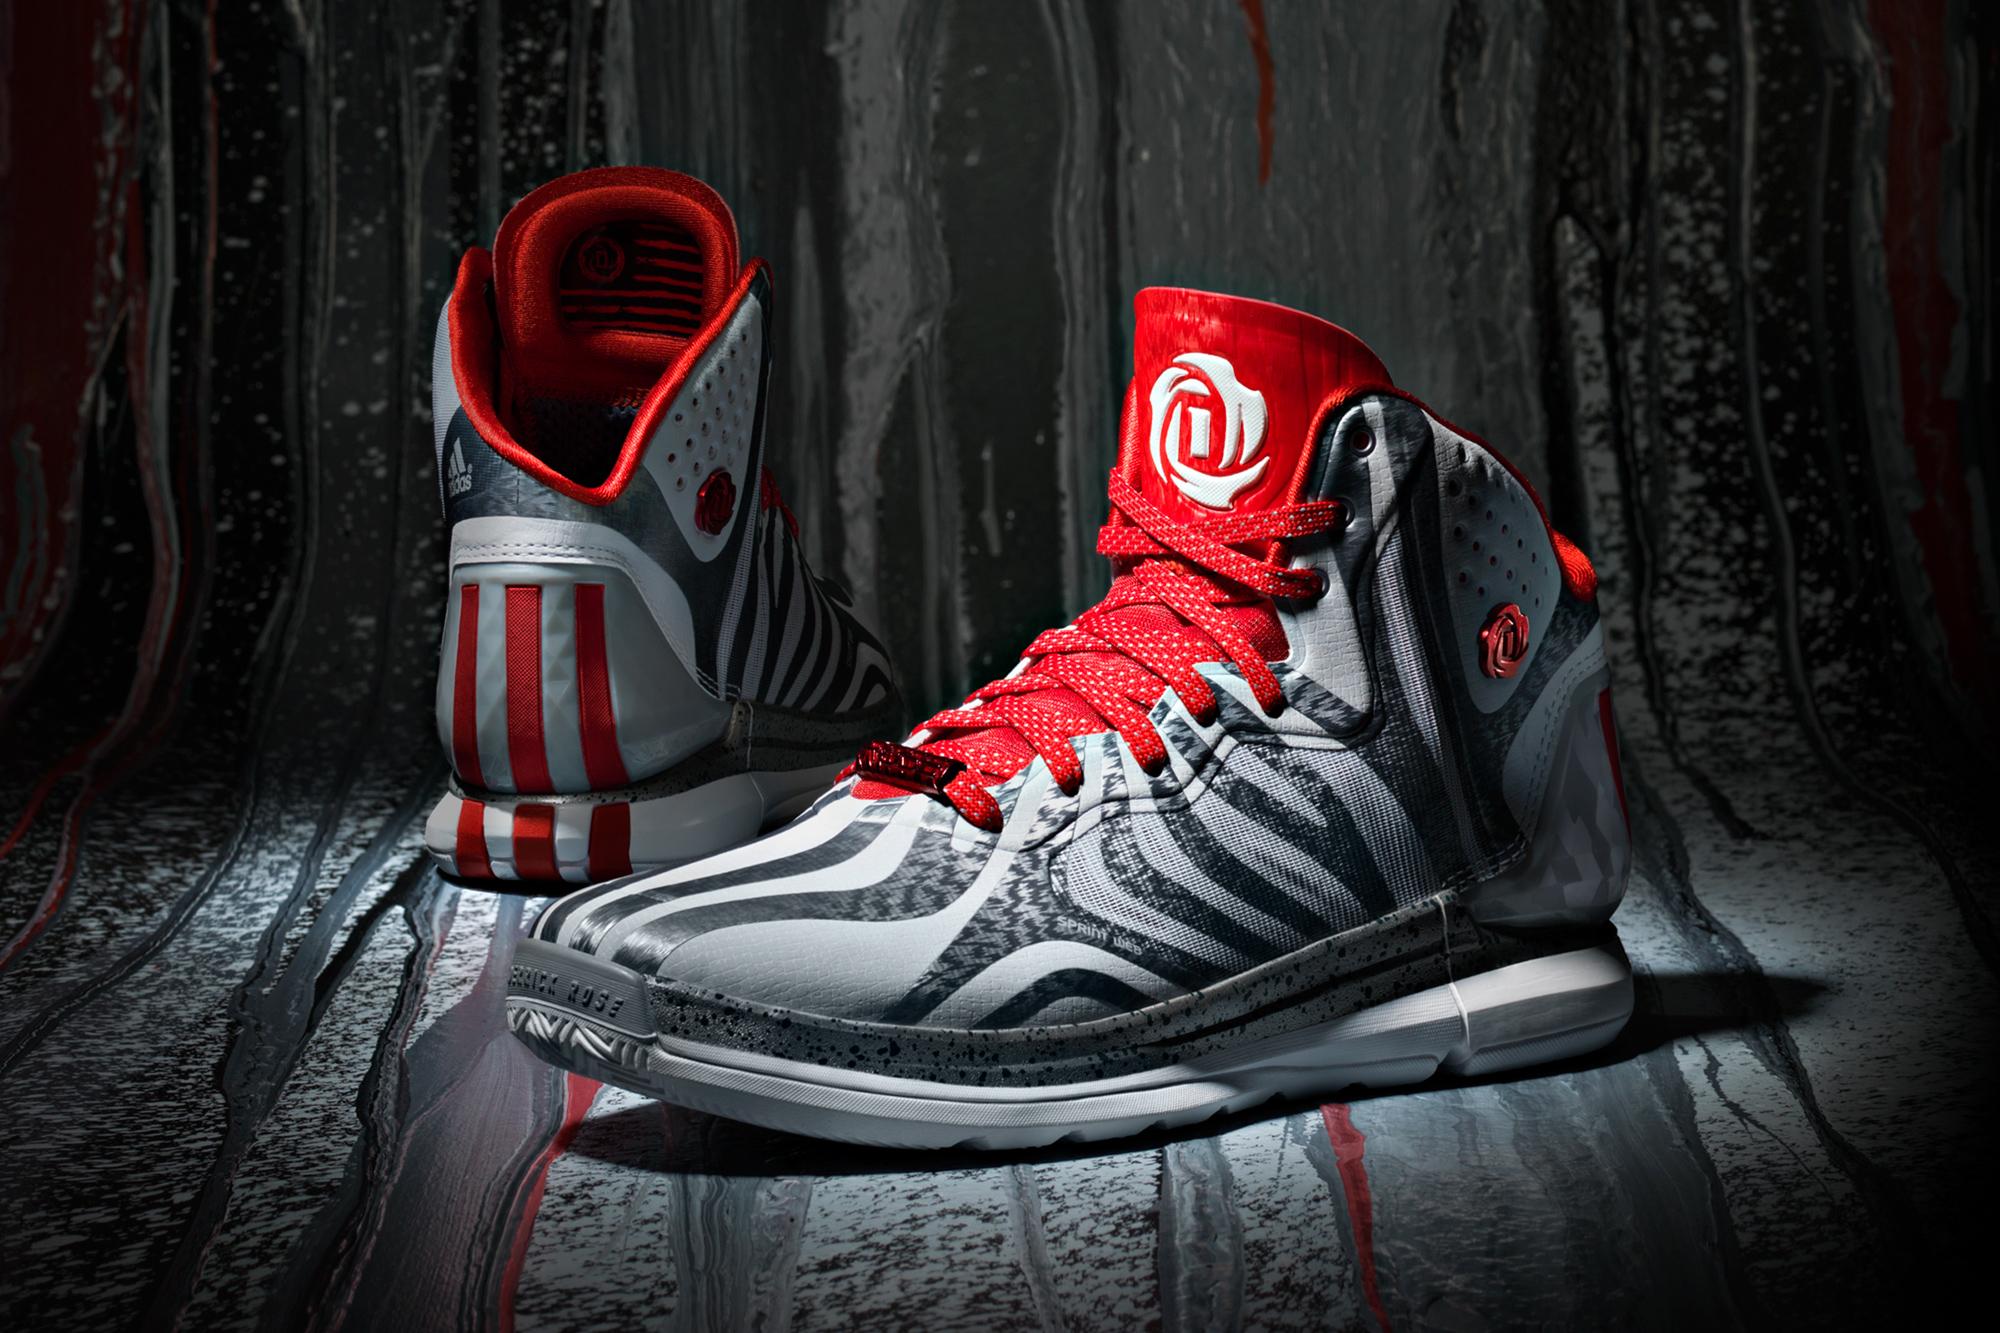 7cefa210922 The adidas D Rose 4.5  Grey - Hardwood and Hollywood